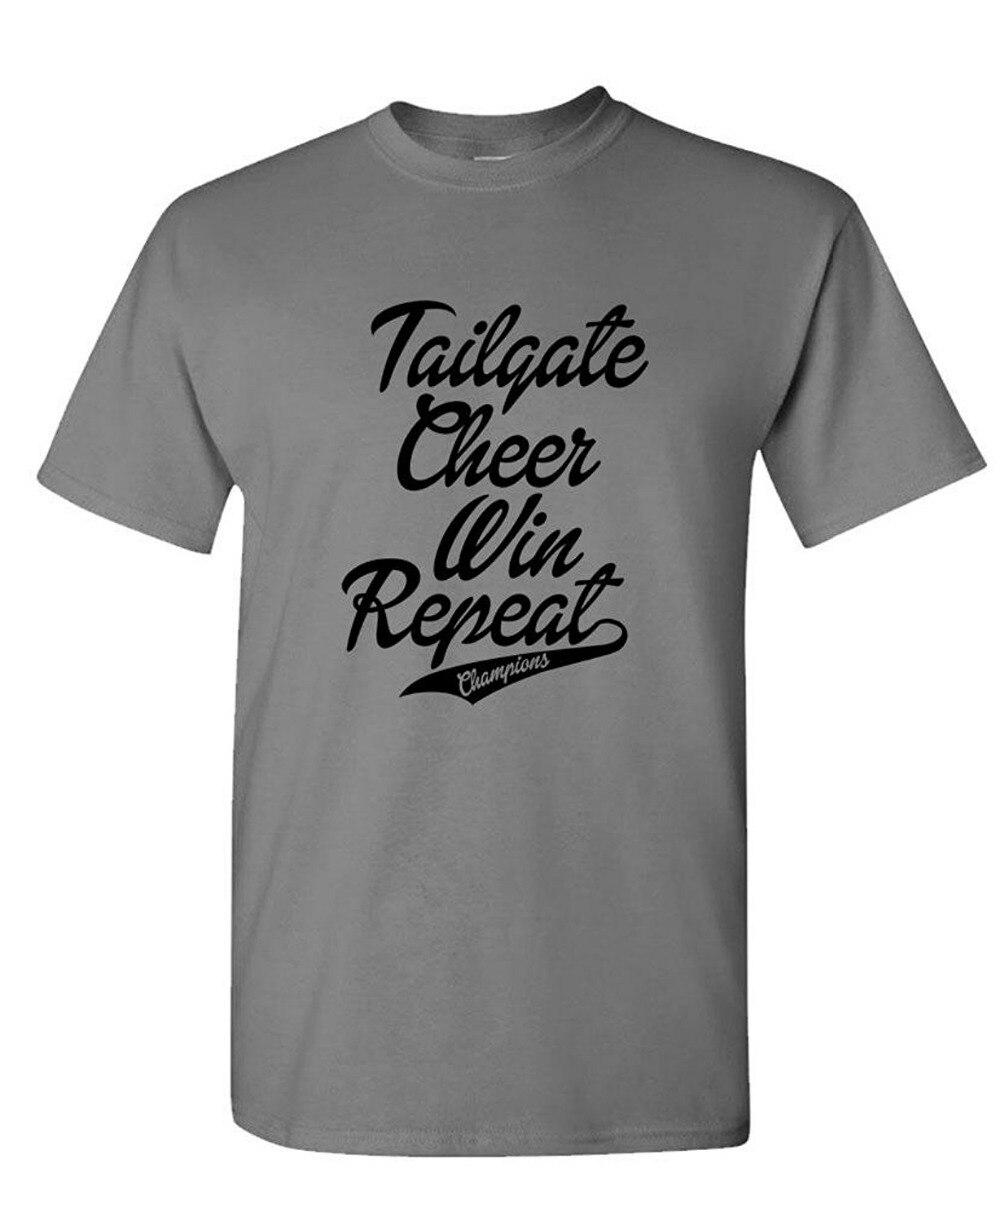 Cotton Cool Design 3D Tee Shirts Premium Crew Neck Short Sleeve Tailgate Cheer Win Repeat Mens Tee Shirts